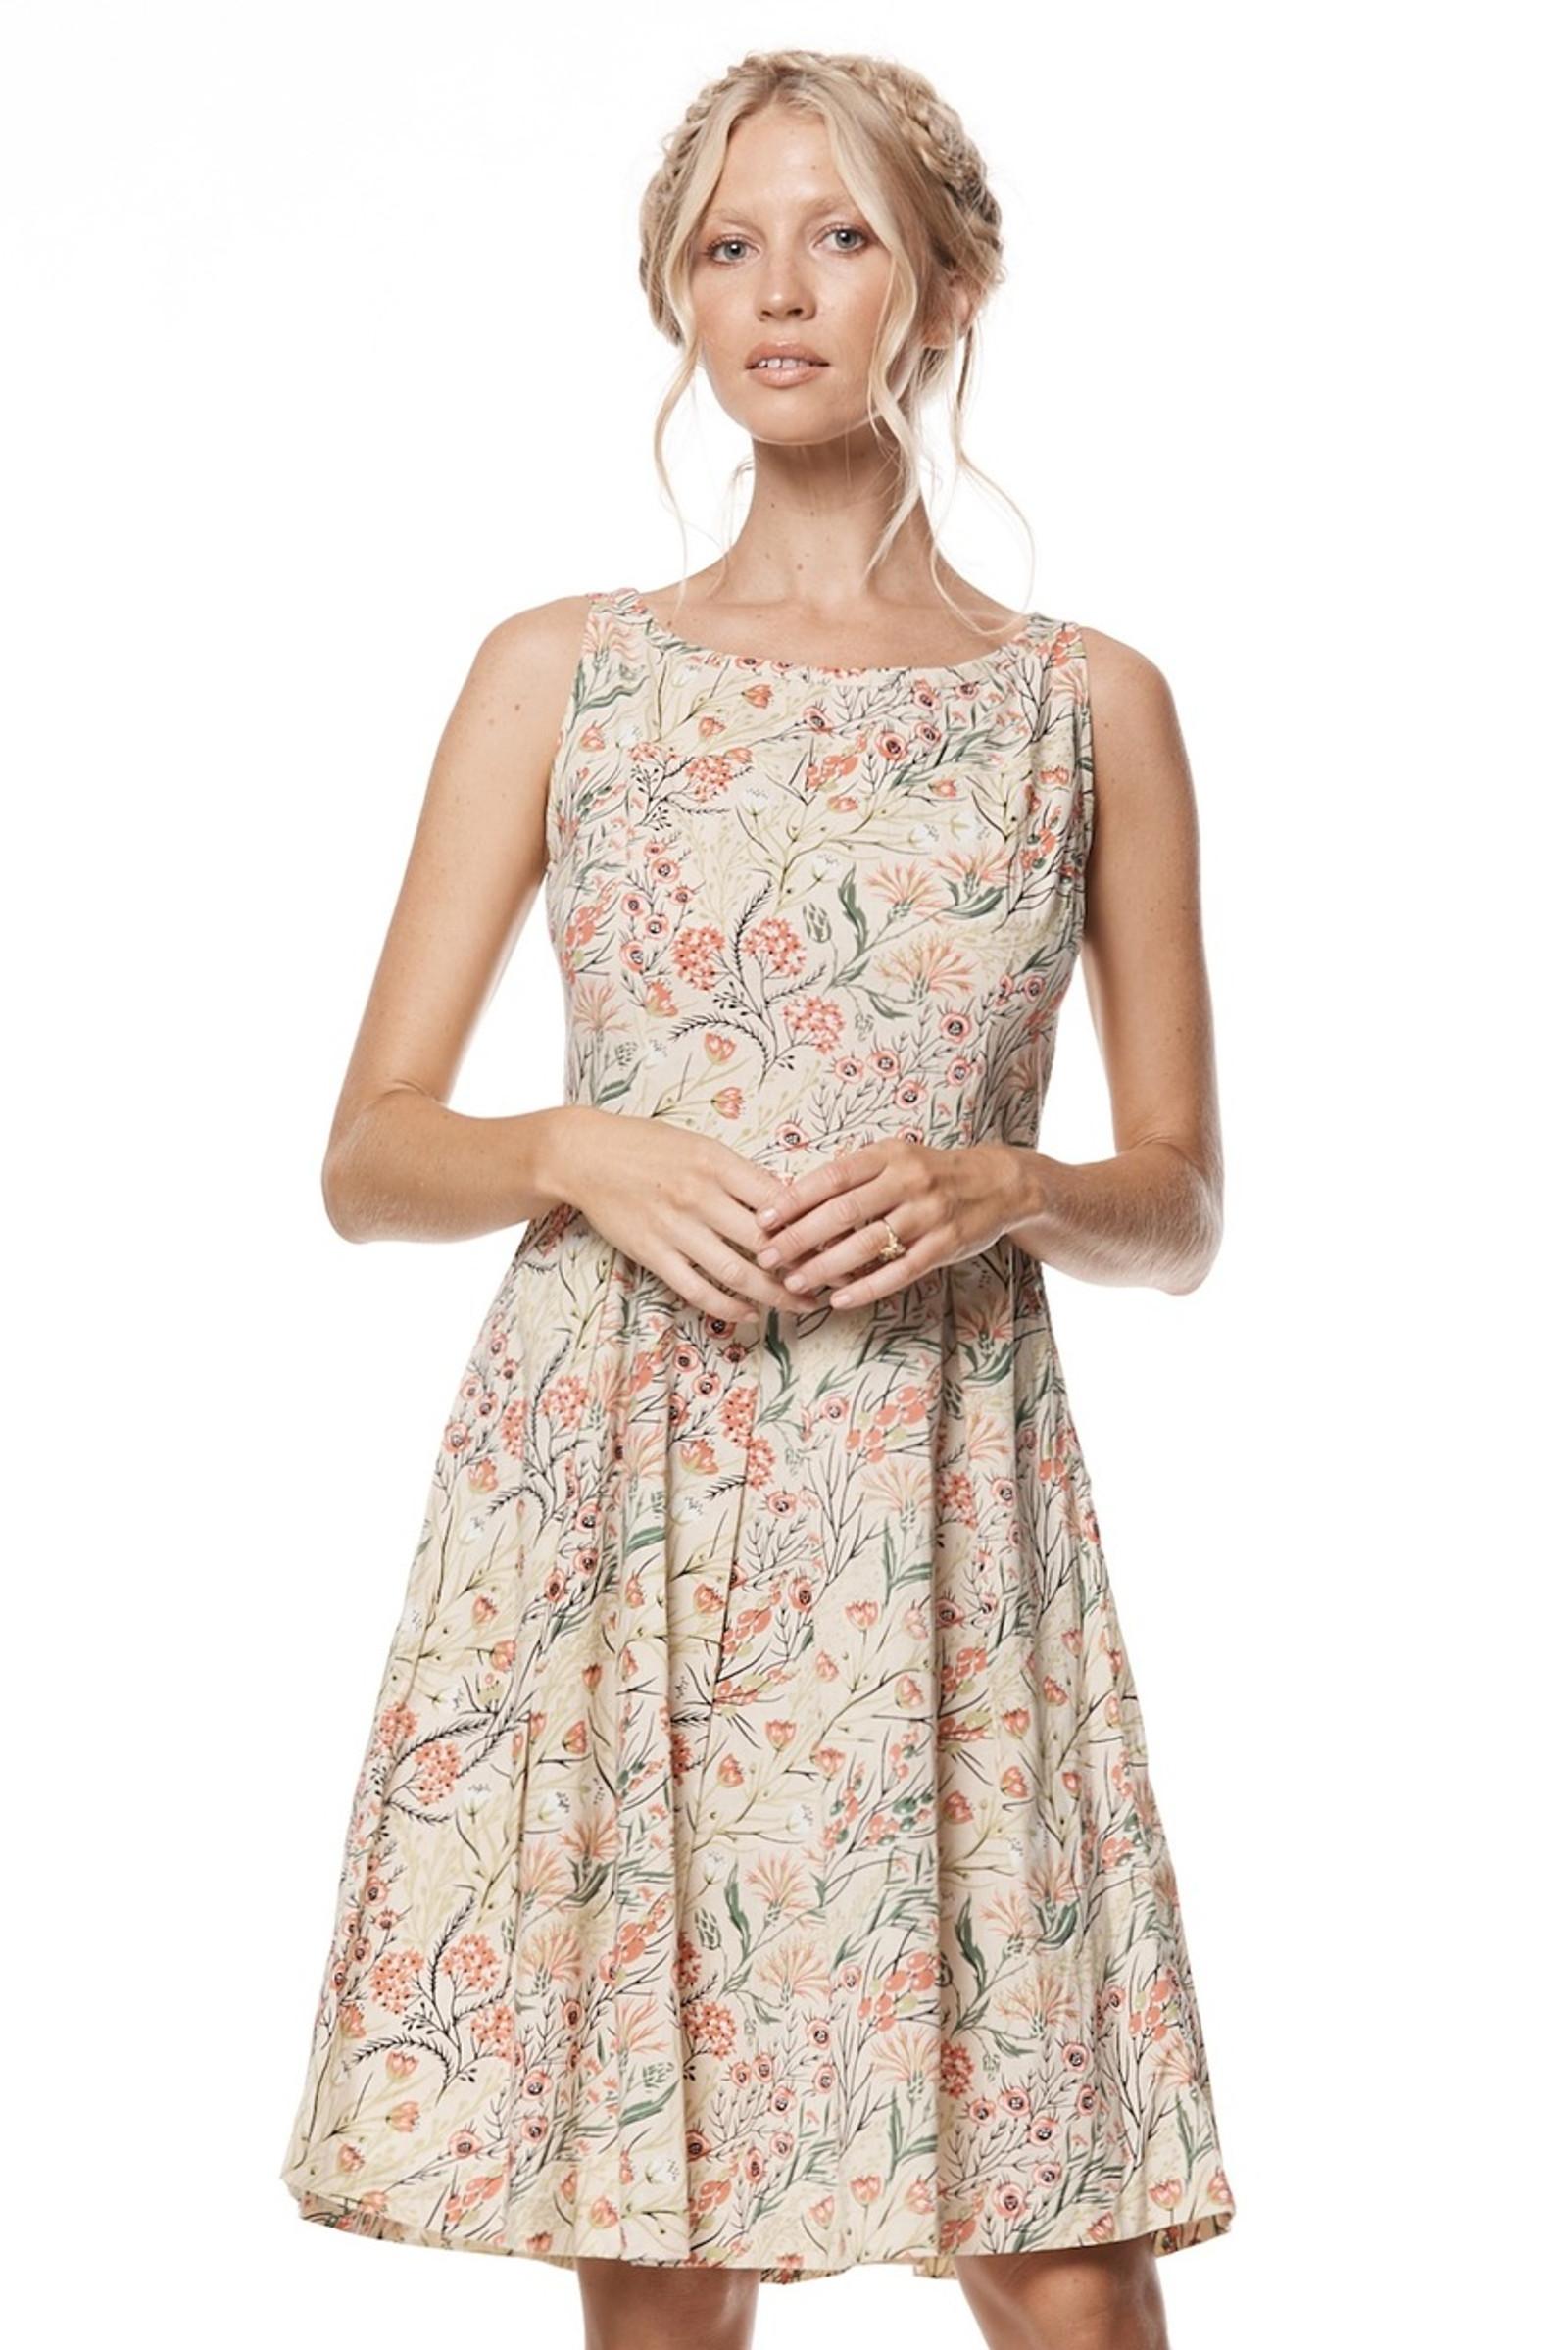 April Dress - Coral